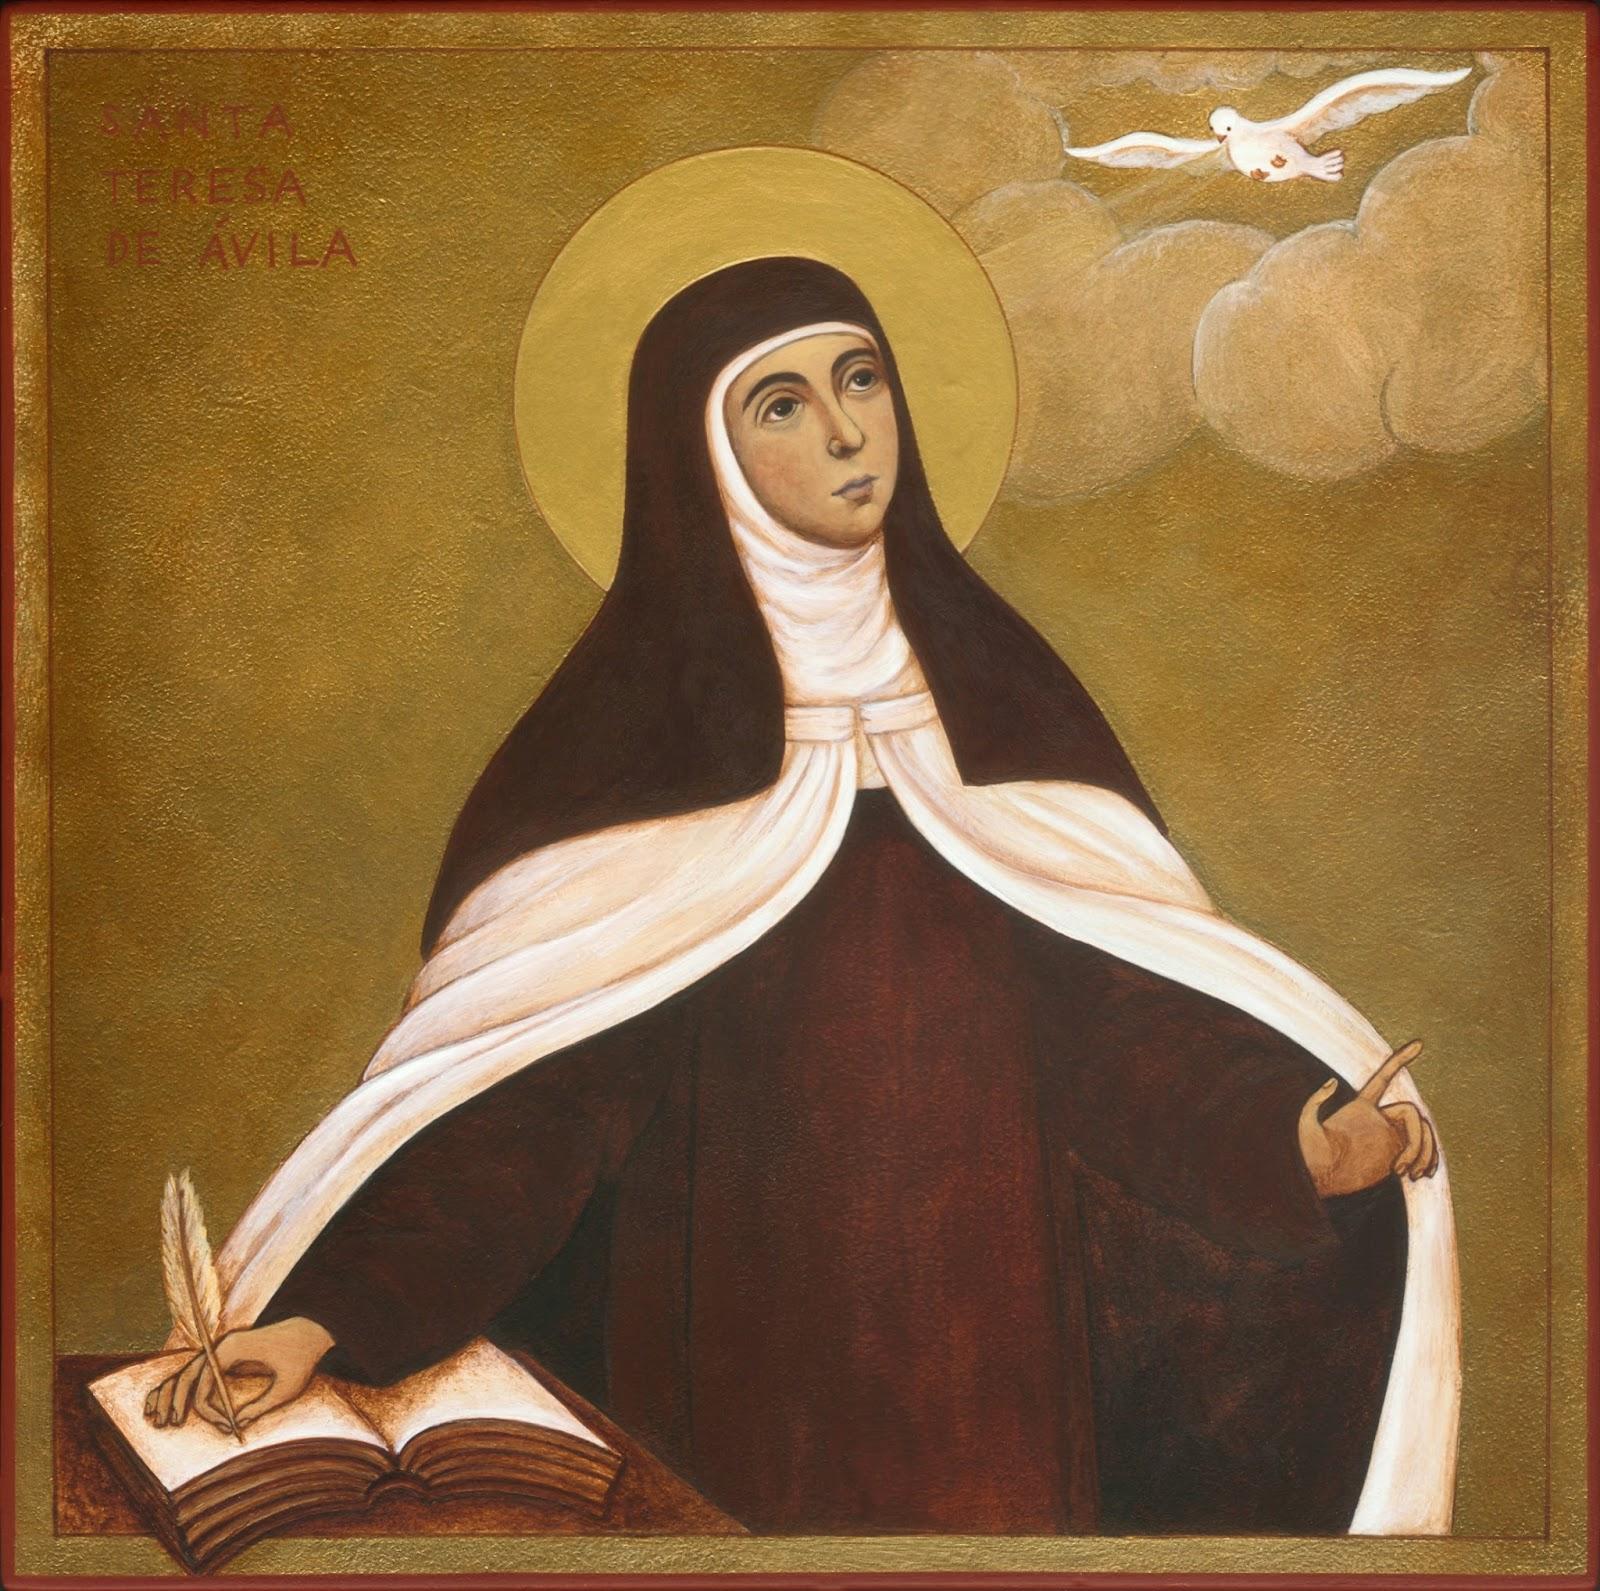 sainte therese d'avila priere